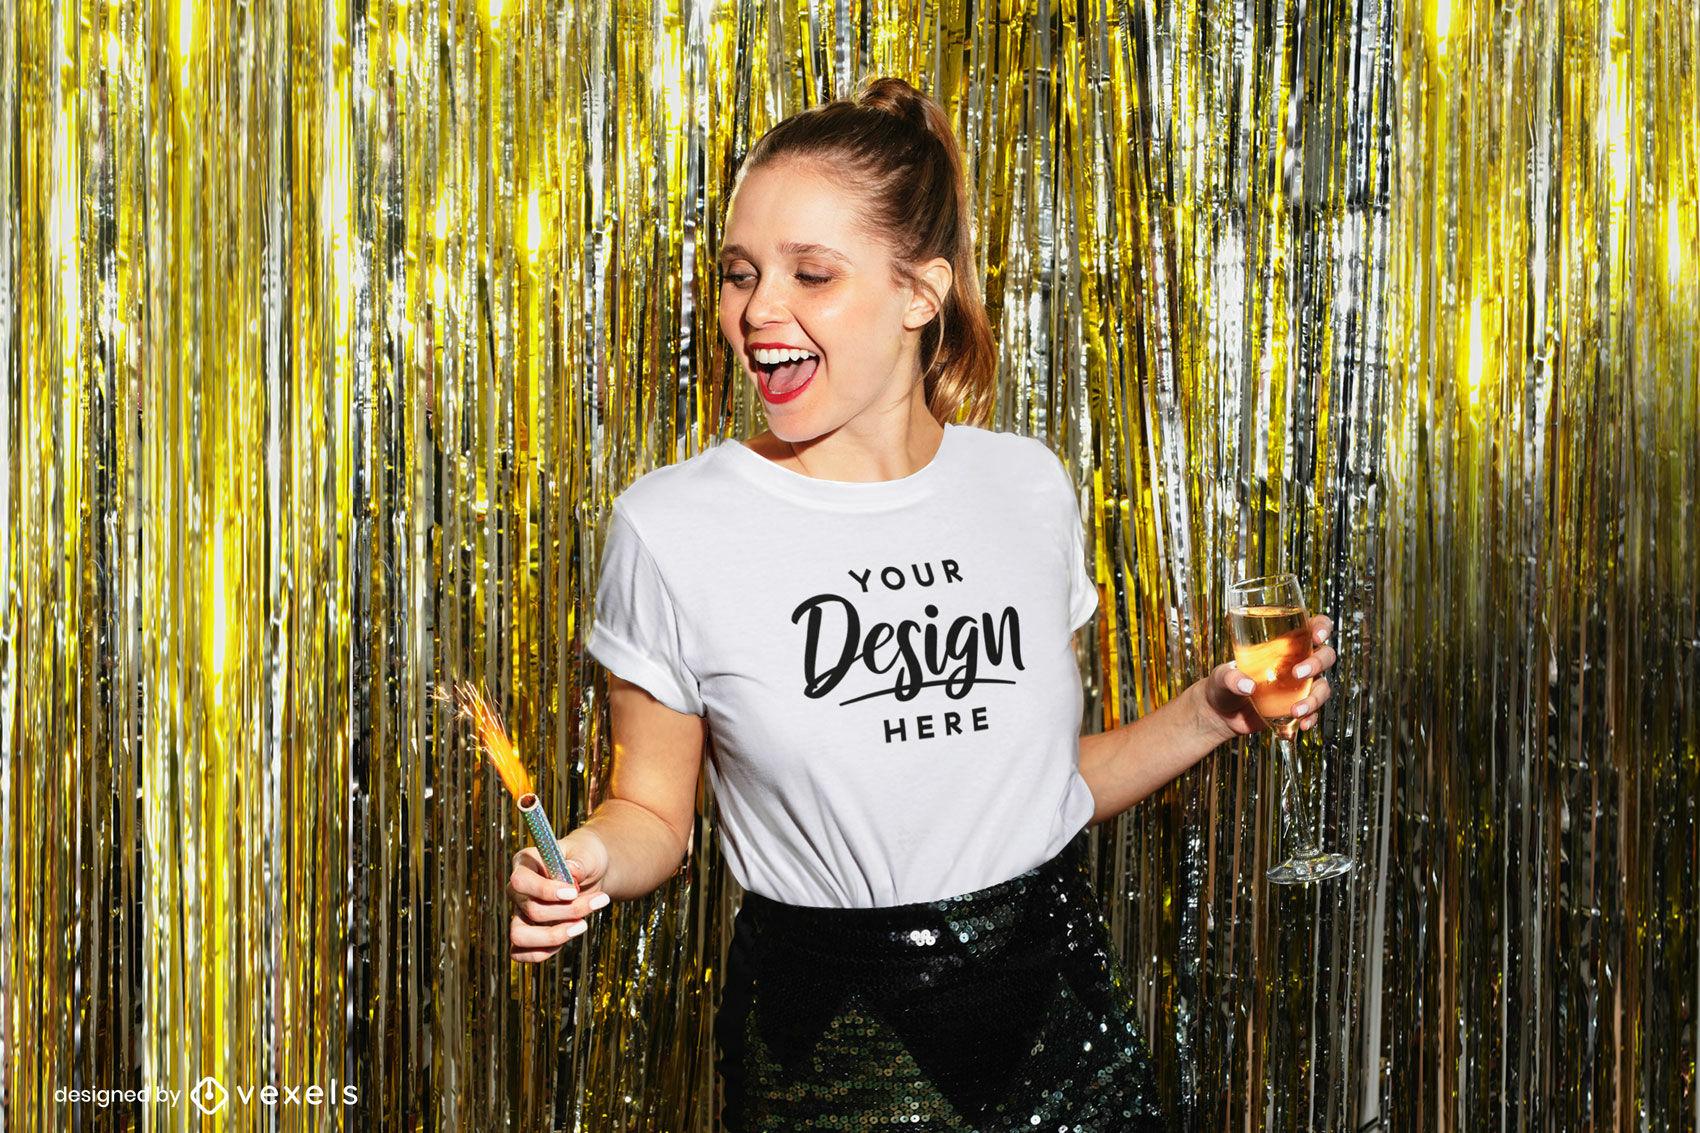 Chica de camiseta blanca en maqueta de fiesta